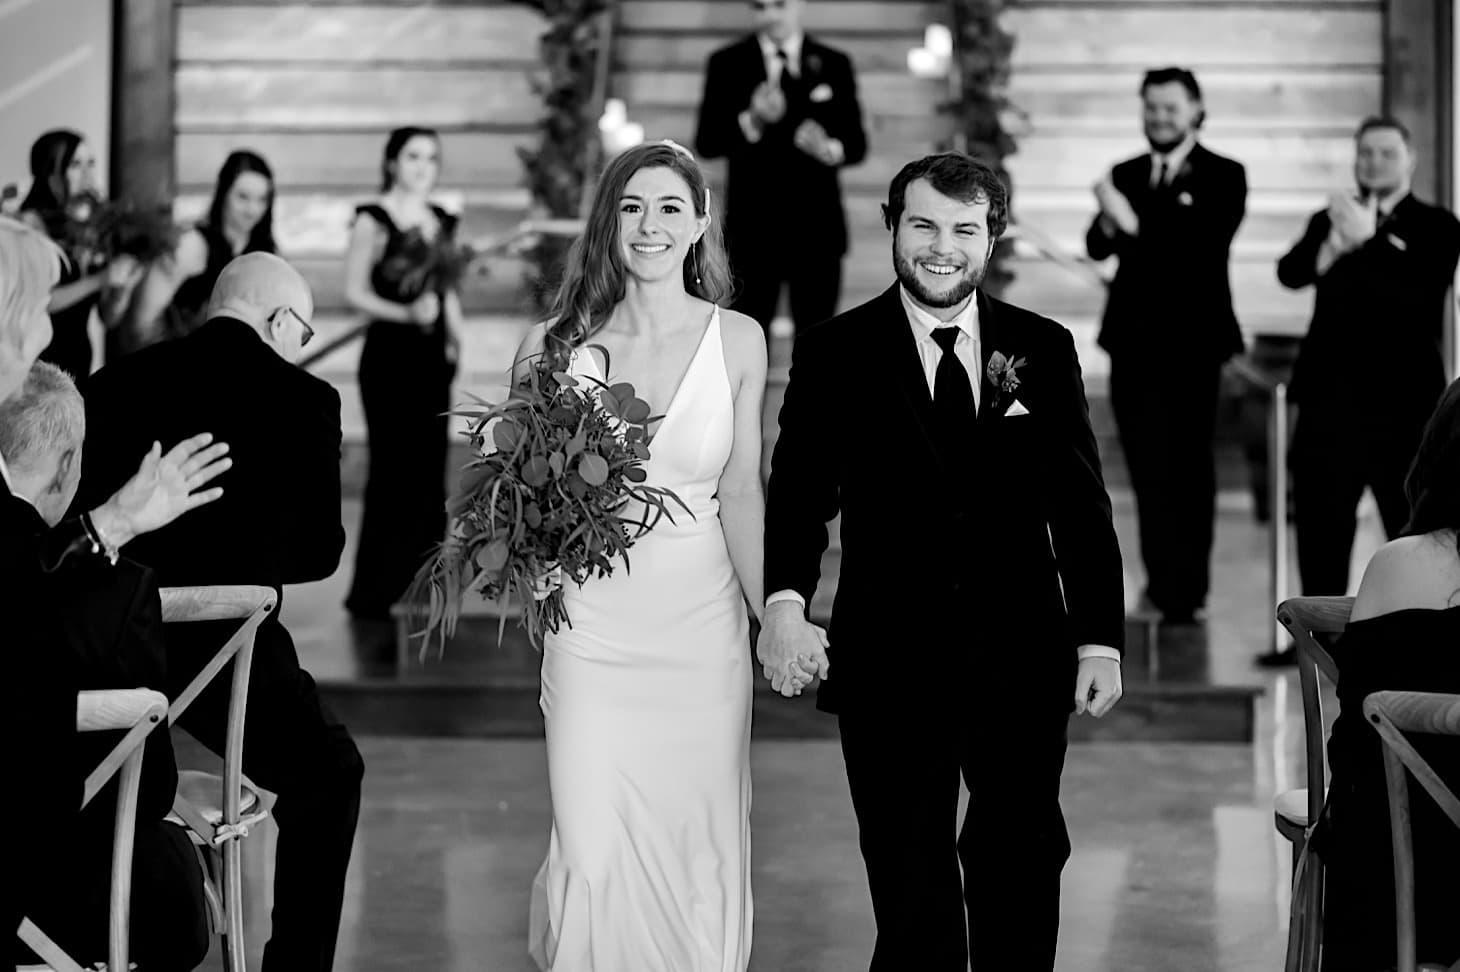 wedding exit at River Center Des Moines